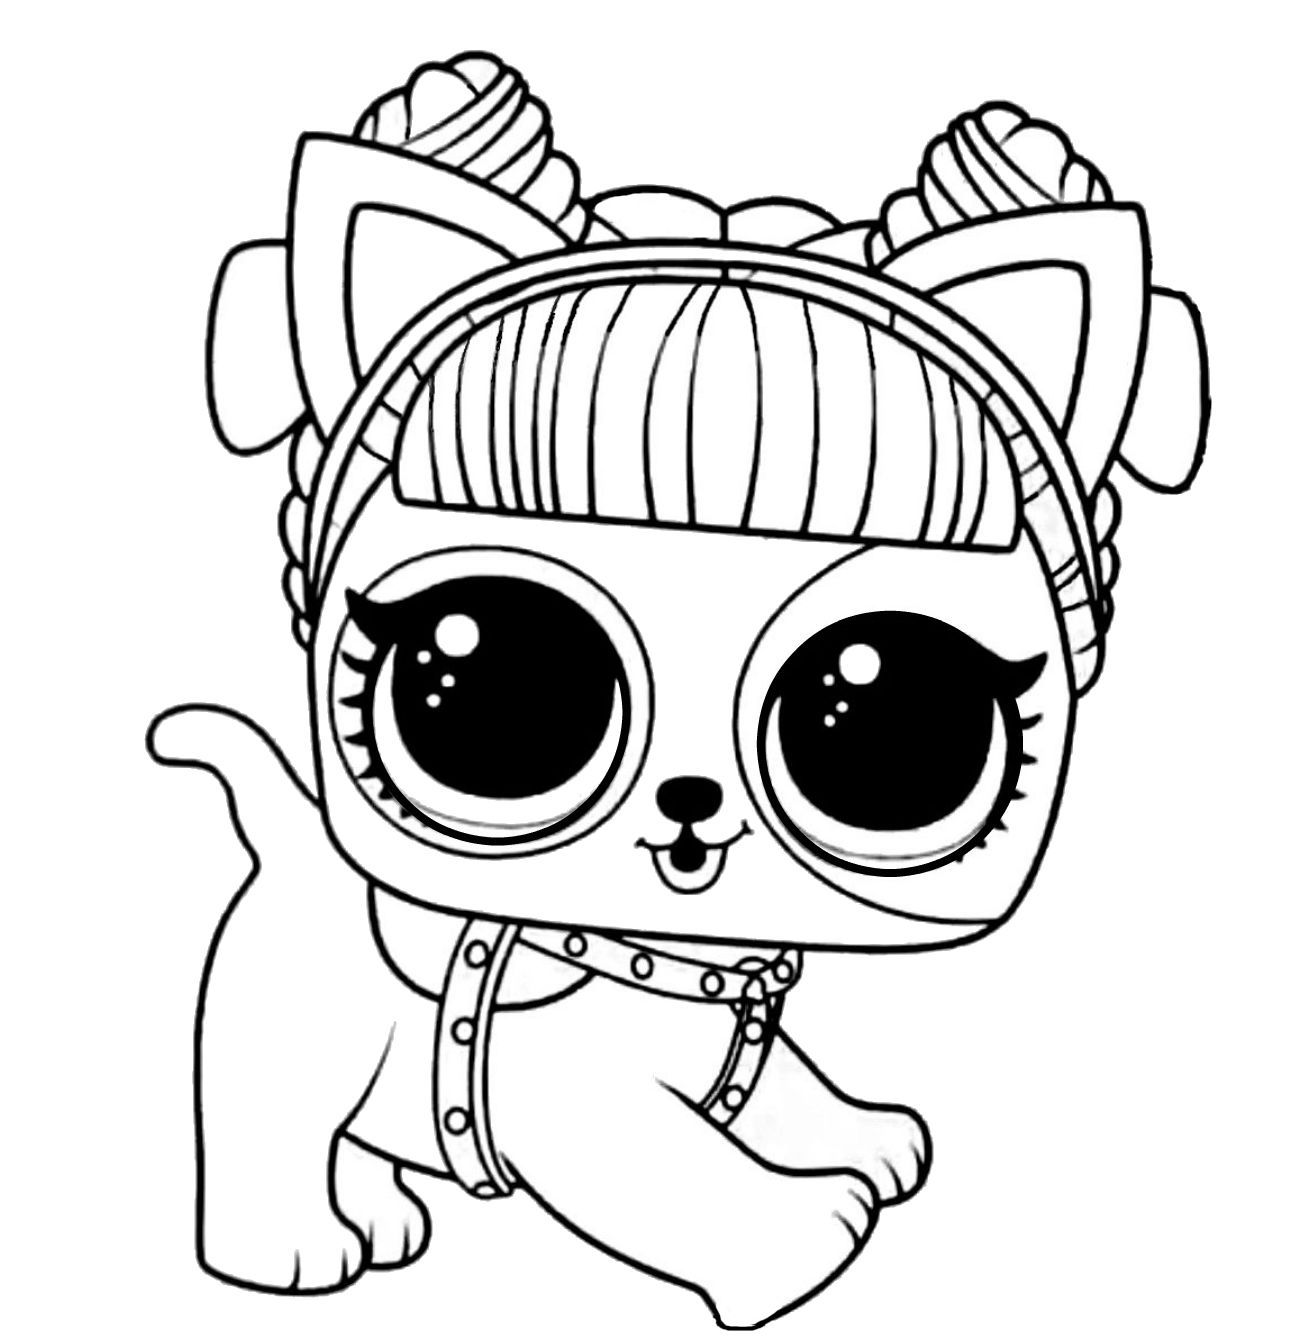 Lol Surprise Coloring Daring Doggie In 2020 Cute Coloring Pages Lol Dolls Coloring Pages For Kids